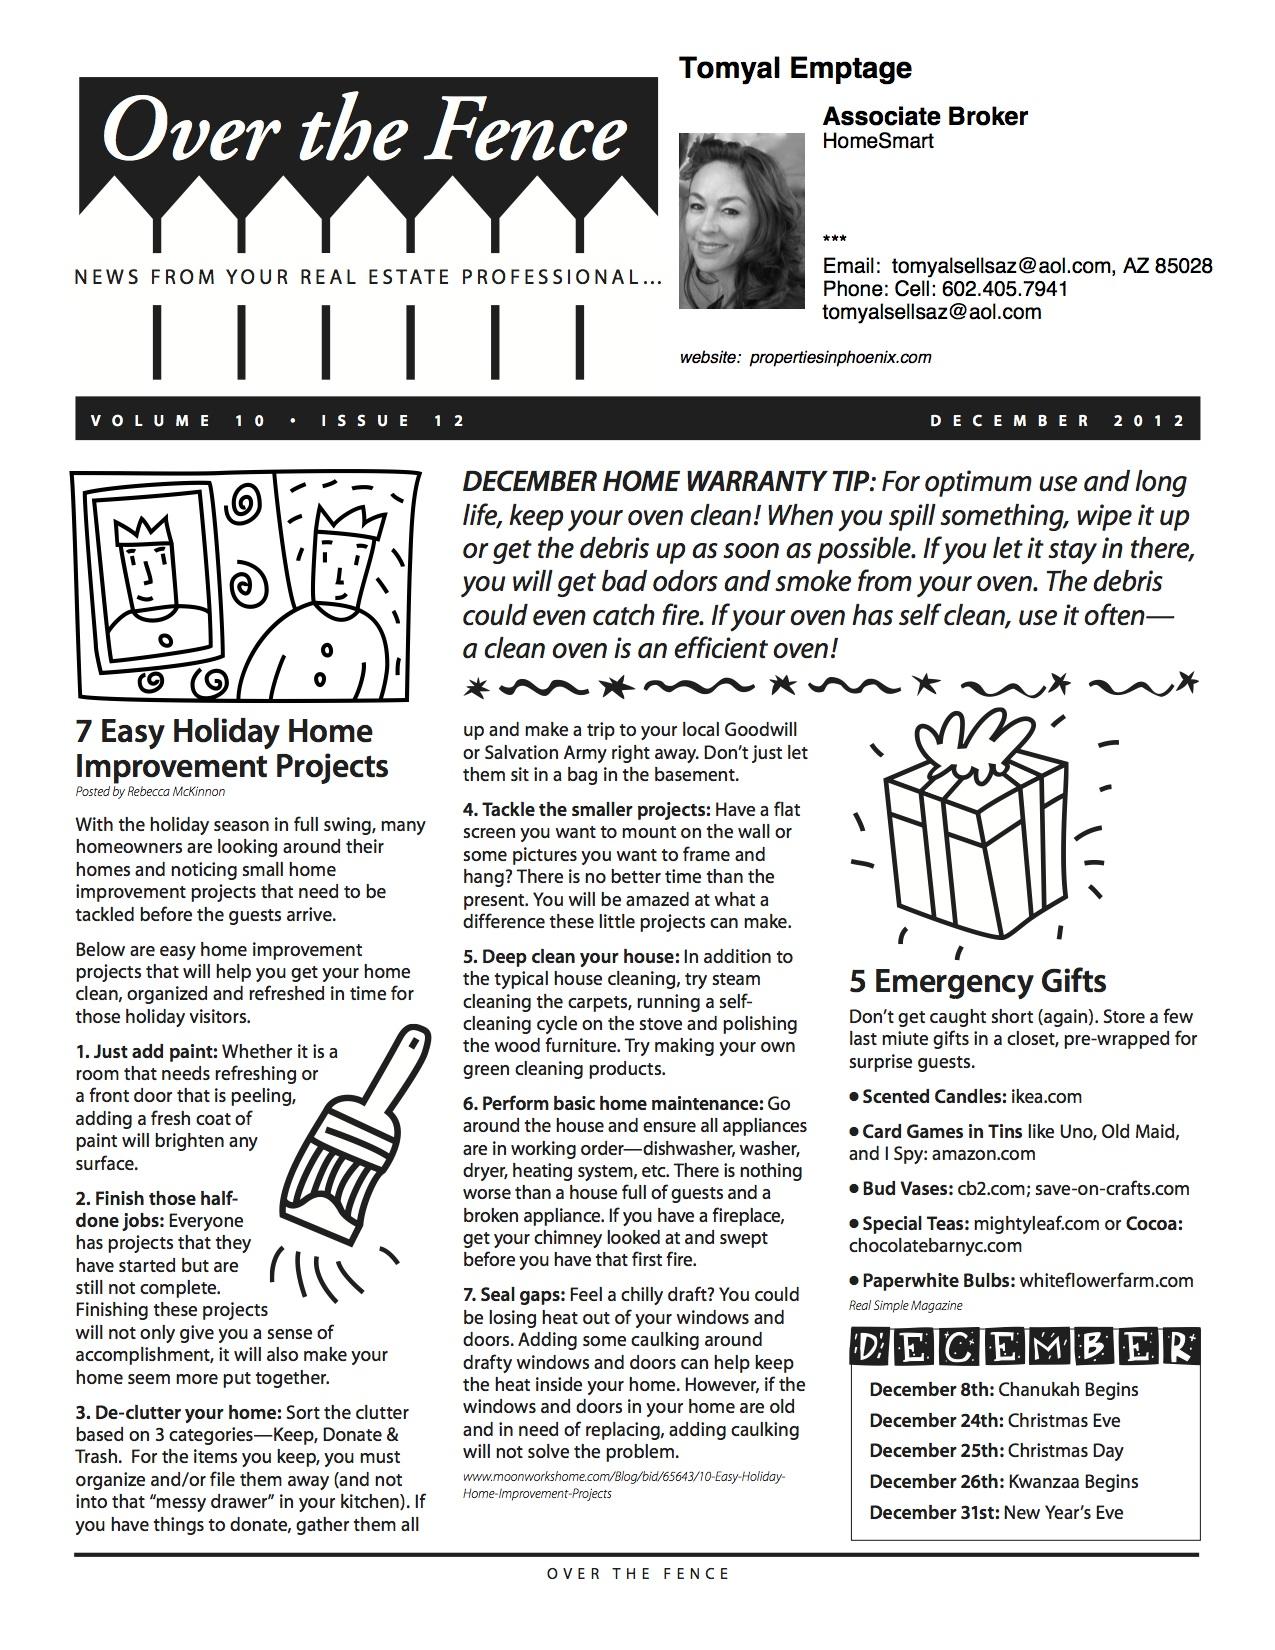 Dec. Warranty Newsletter.jpg